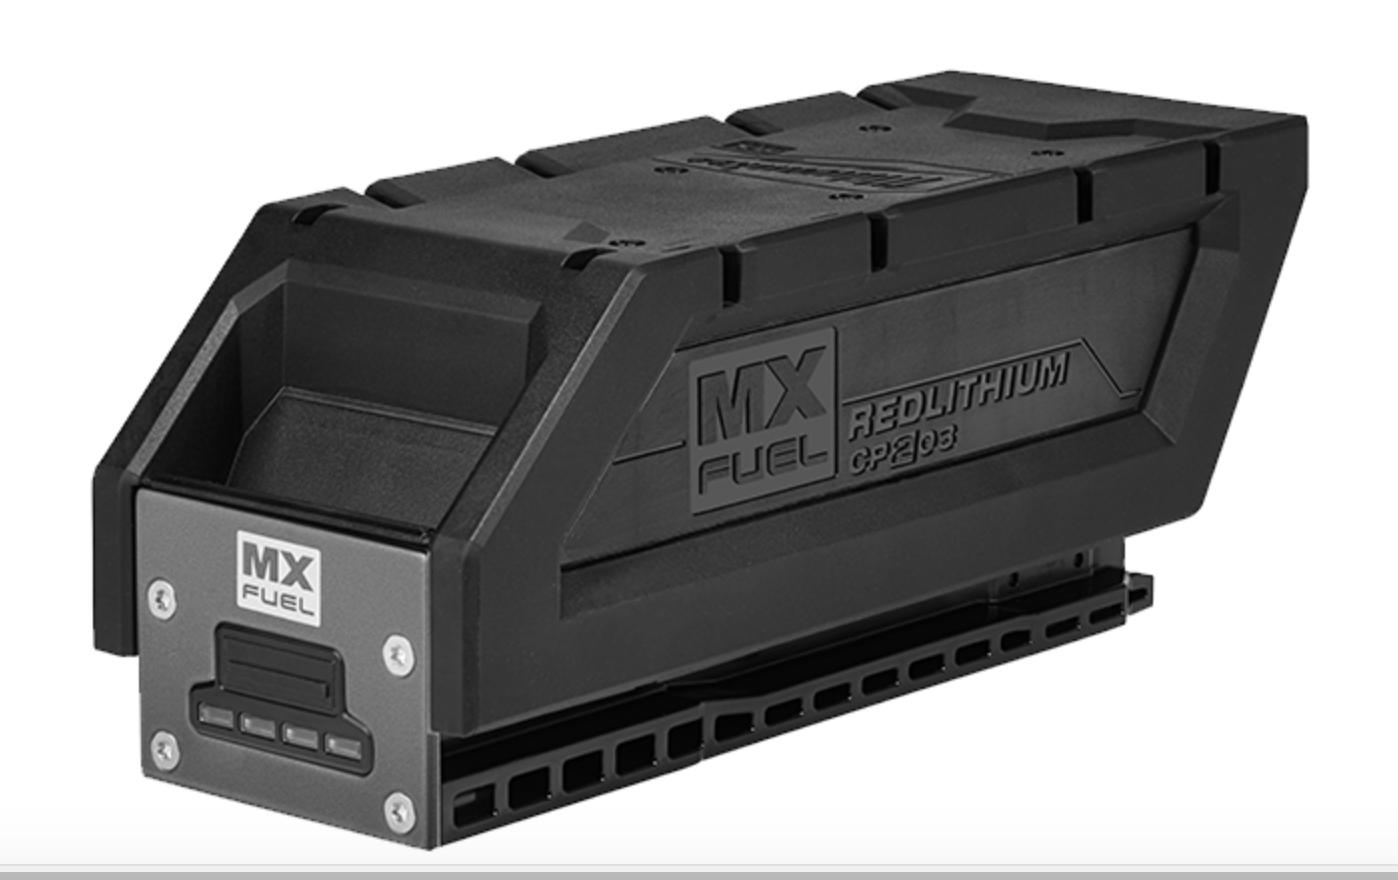 Milwaukee MX Fuel CP 203 battery